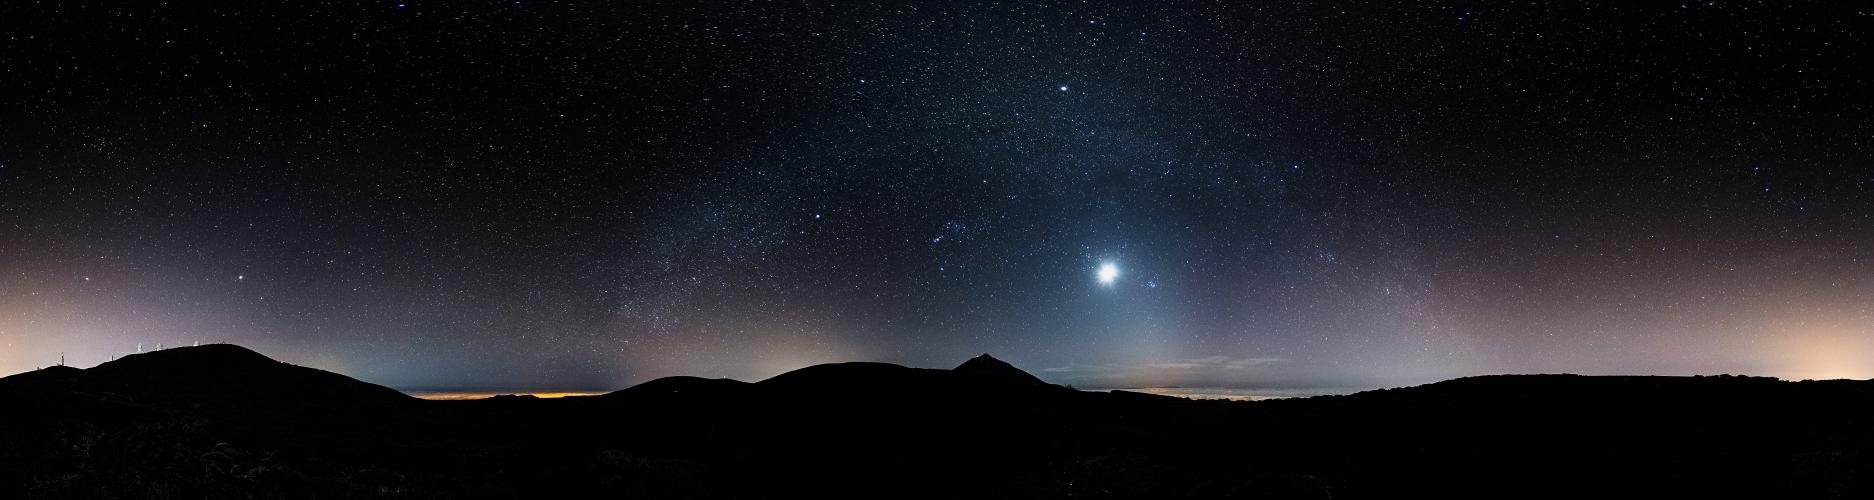 Observatorio del Teide Panorama